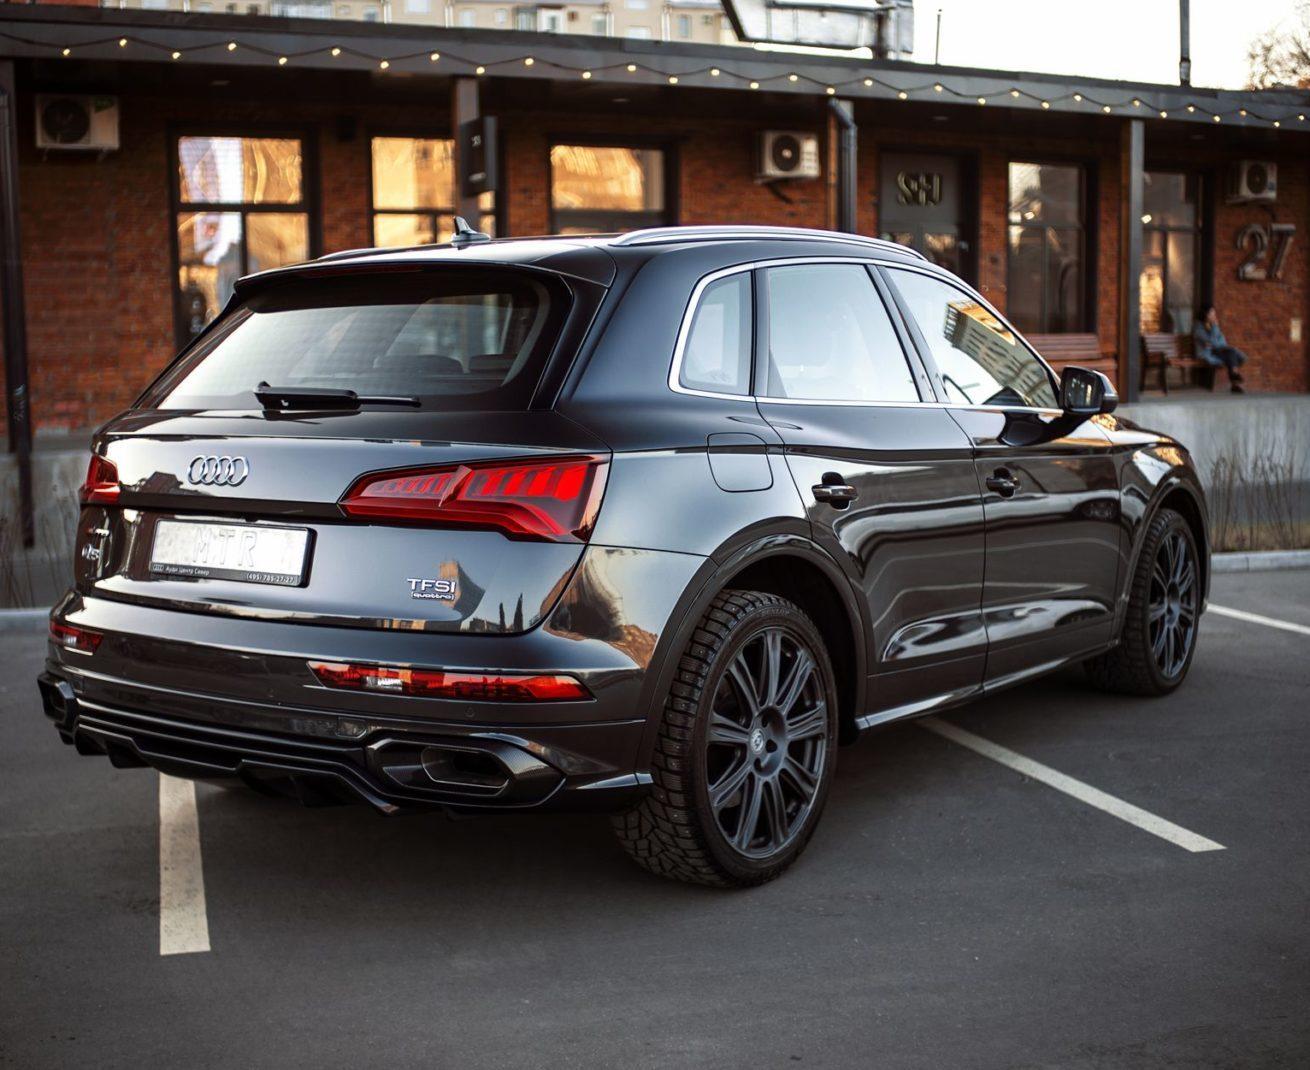 MTR Design Body Kit for Audi Q5/SQ5 latest model